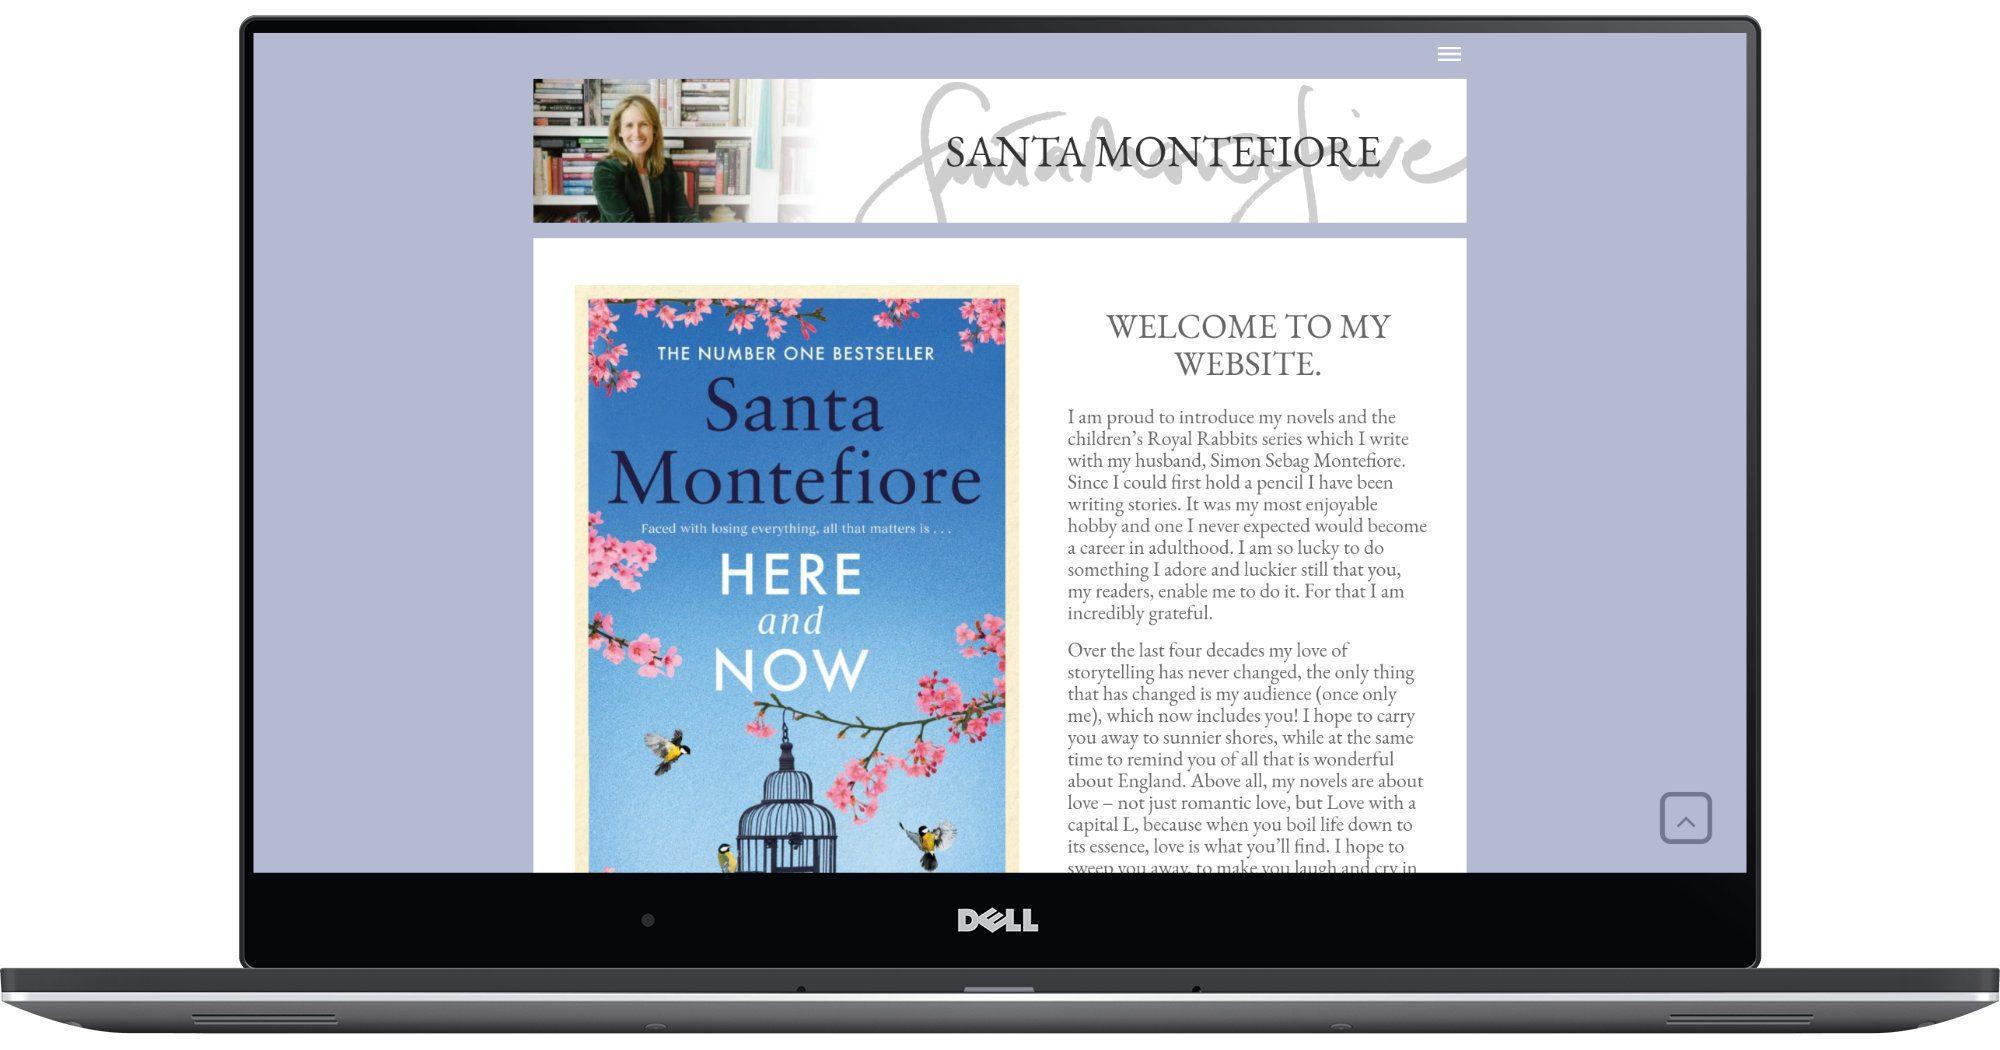 Santa Montefiore Laptop Screenshot